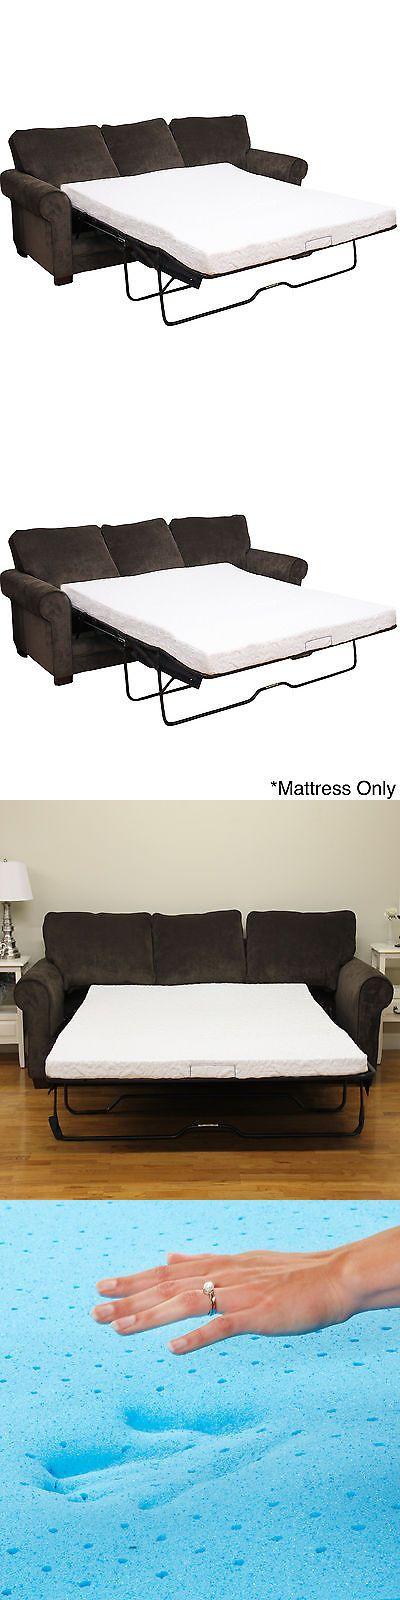 Mattresses 131588: Postureloft Kendall 4.5-Inch Full-Size Gel Memory Foam Sofa Bed Mattress -> BUY IT NOW ONLY: $130.49 on eBay!